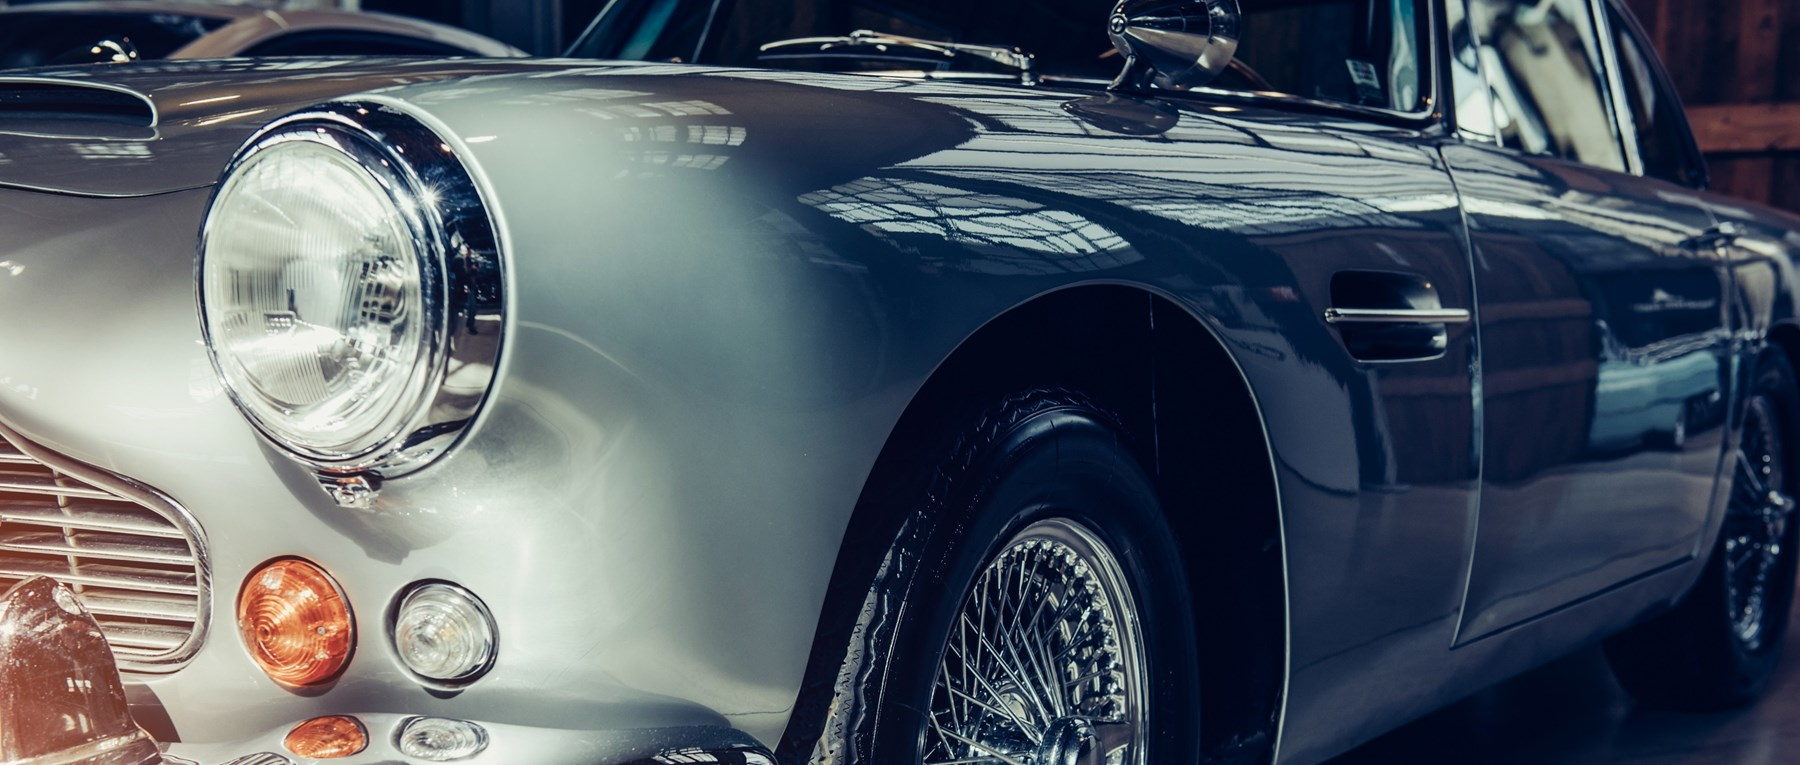 Silver classic car